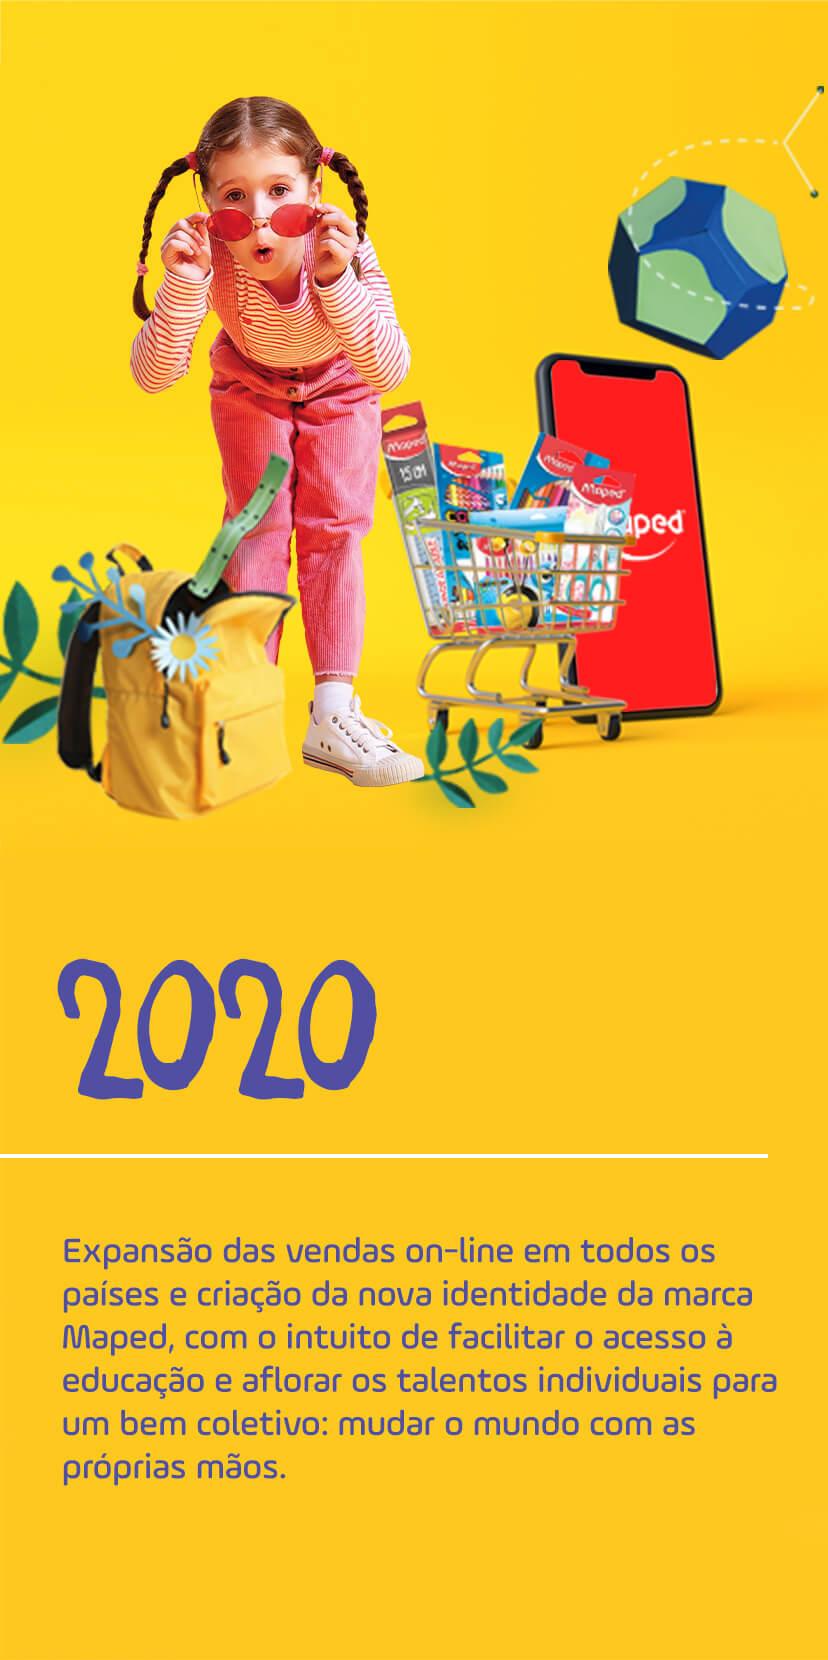 09 mobile 2020